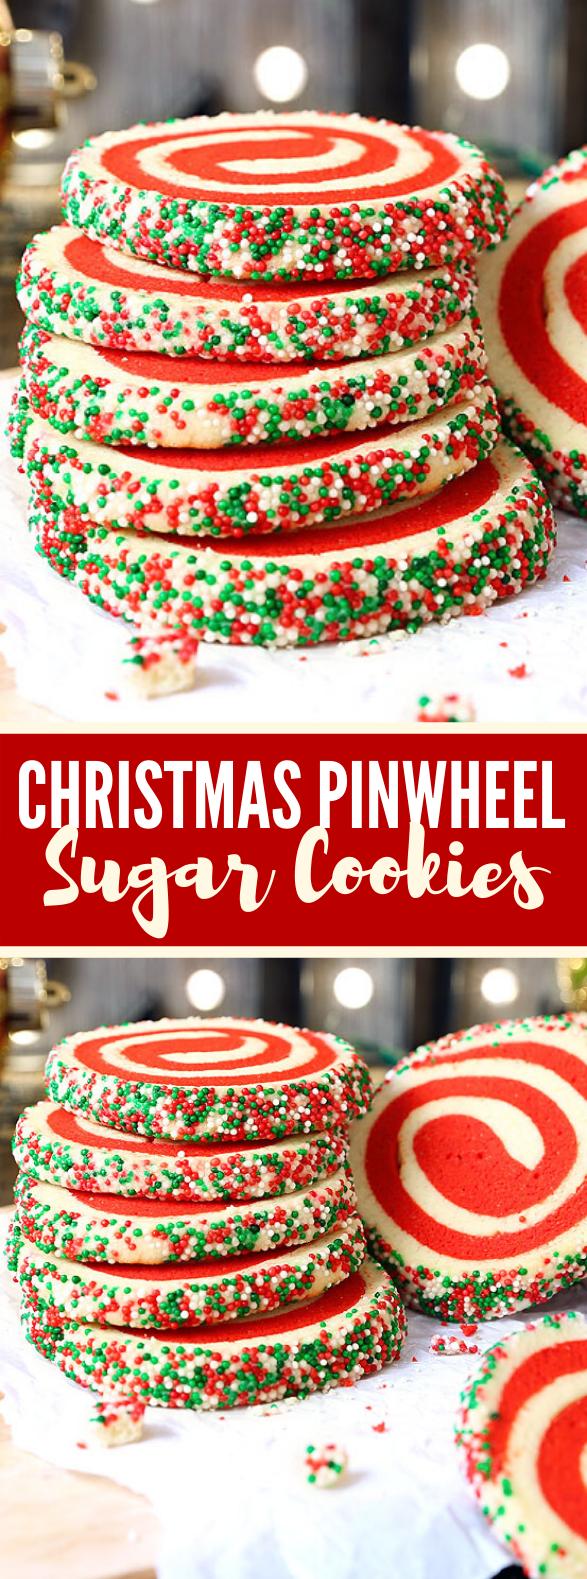 Christmas Pinwheel Sugar Cookies #desserts #sweets